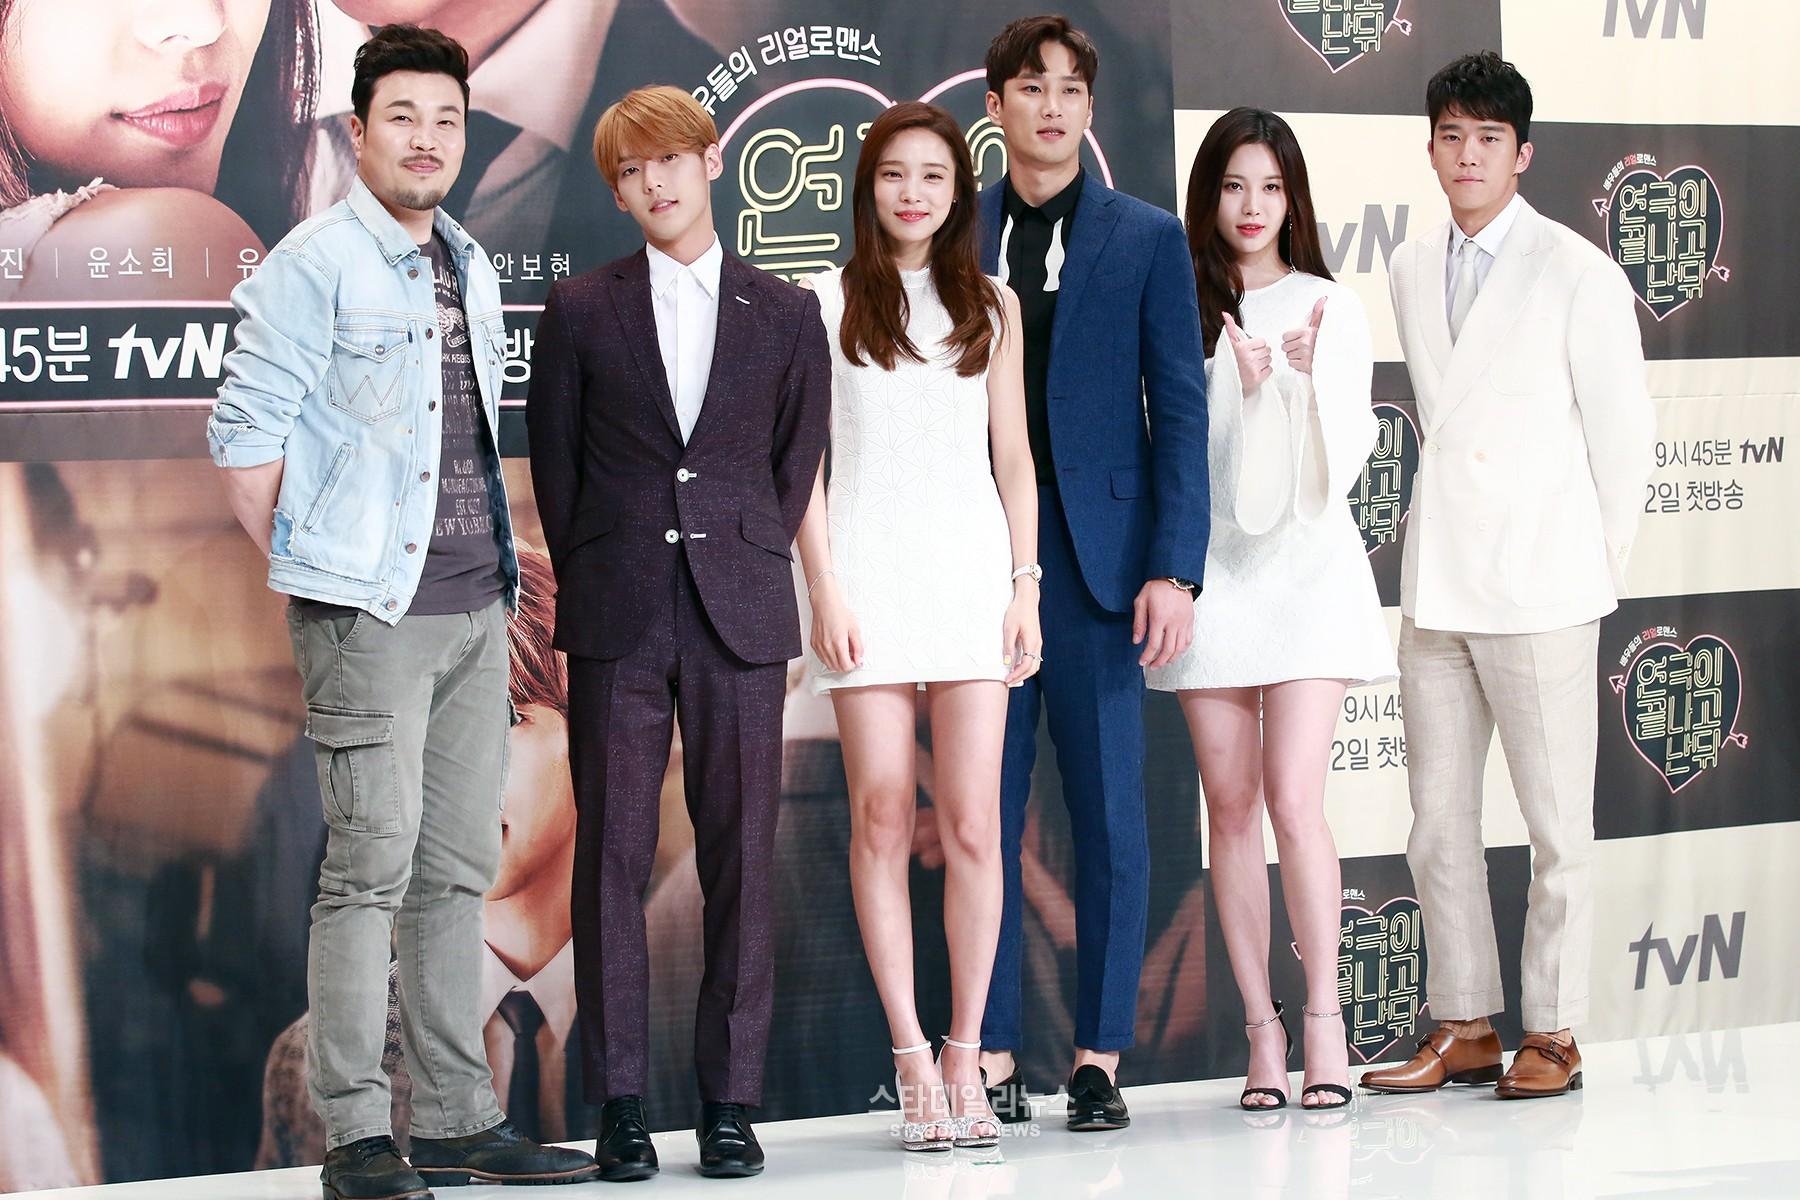 Co-Star Couples Such As Ahn Jae Hyun And Ku Hye Sun Inspire New tvN Drama/Reality Show